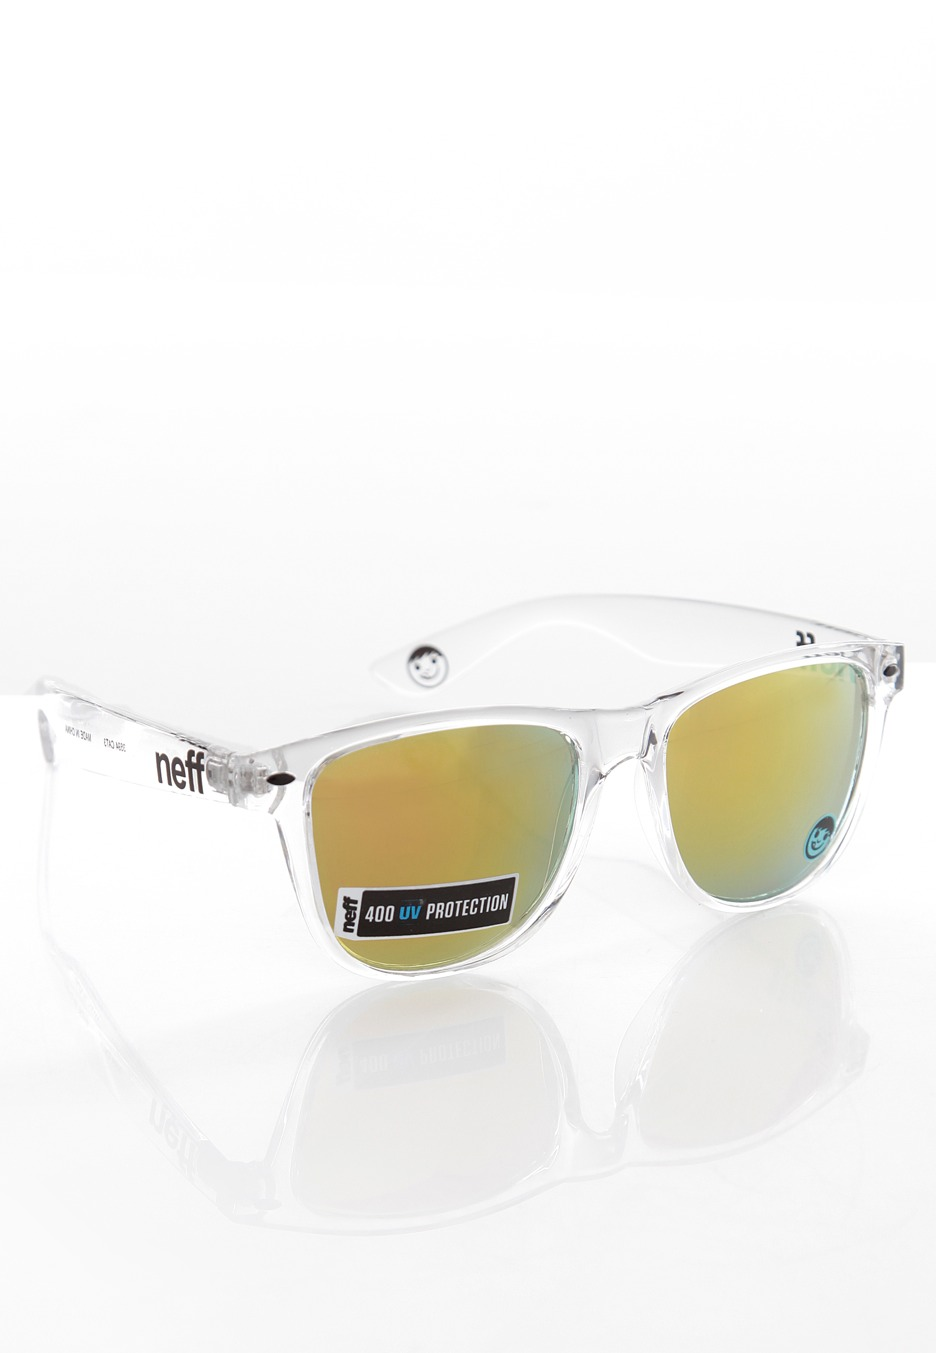 edcb175f539 Neff - Daily Clear - Sunglasses - Impericon.com Worldwide